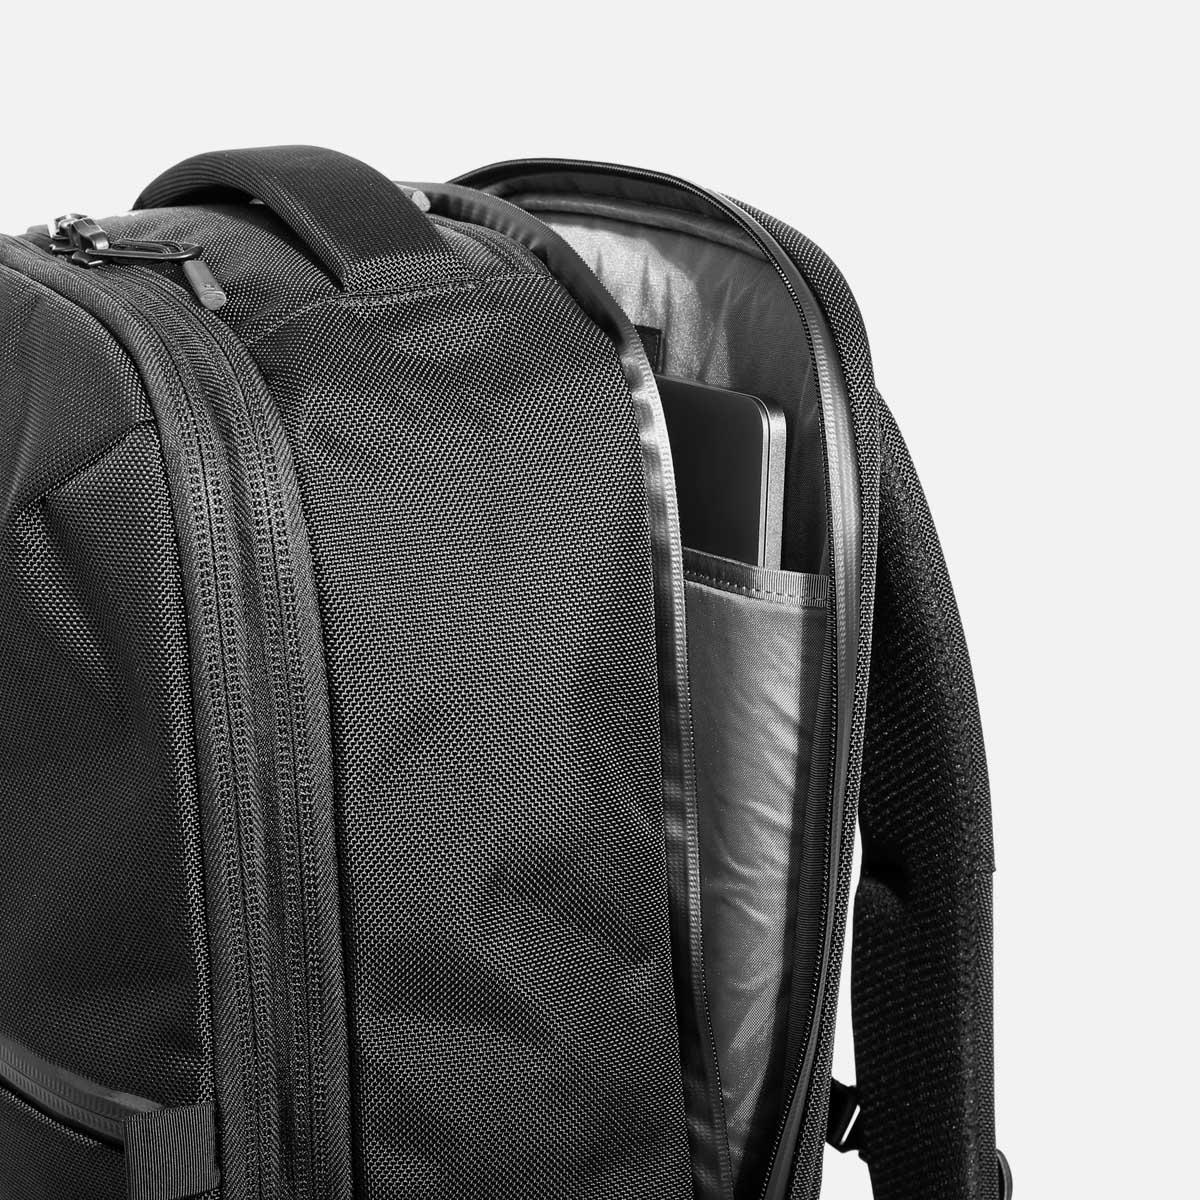 AER21022_travelpack2small_laptop.jpg